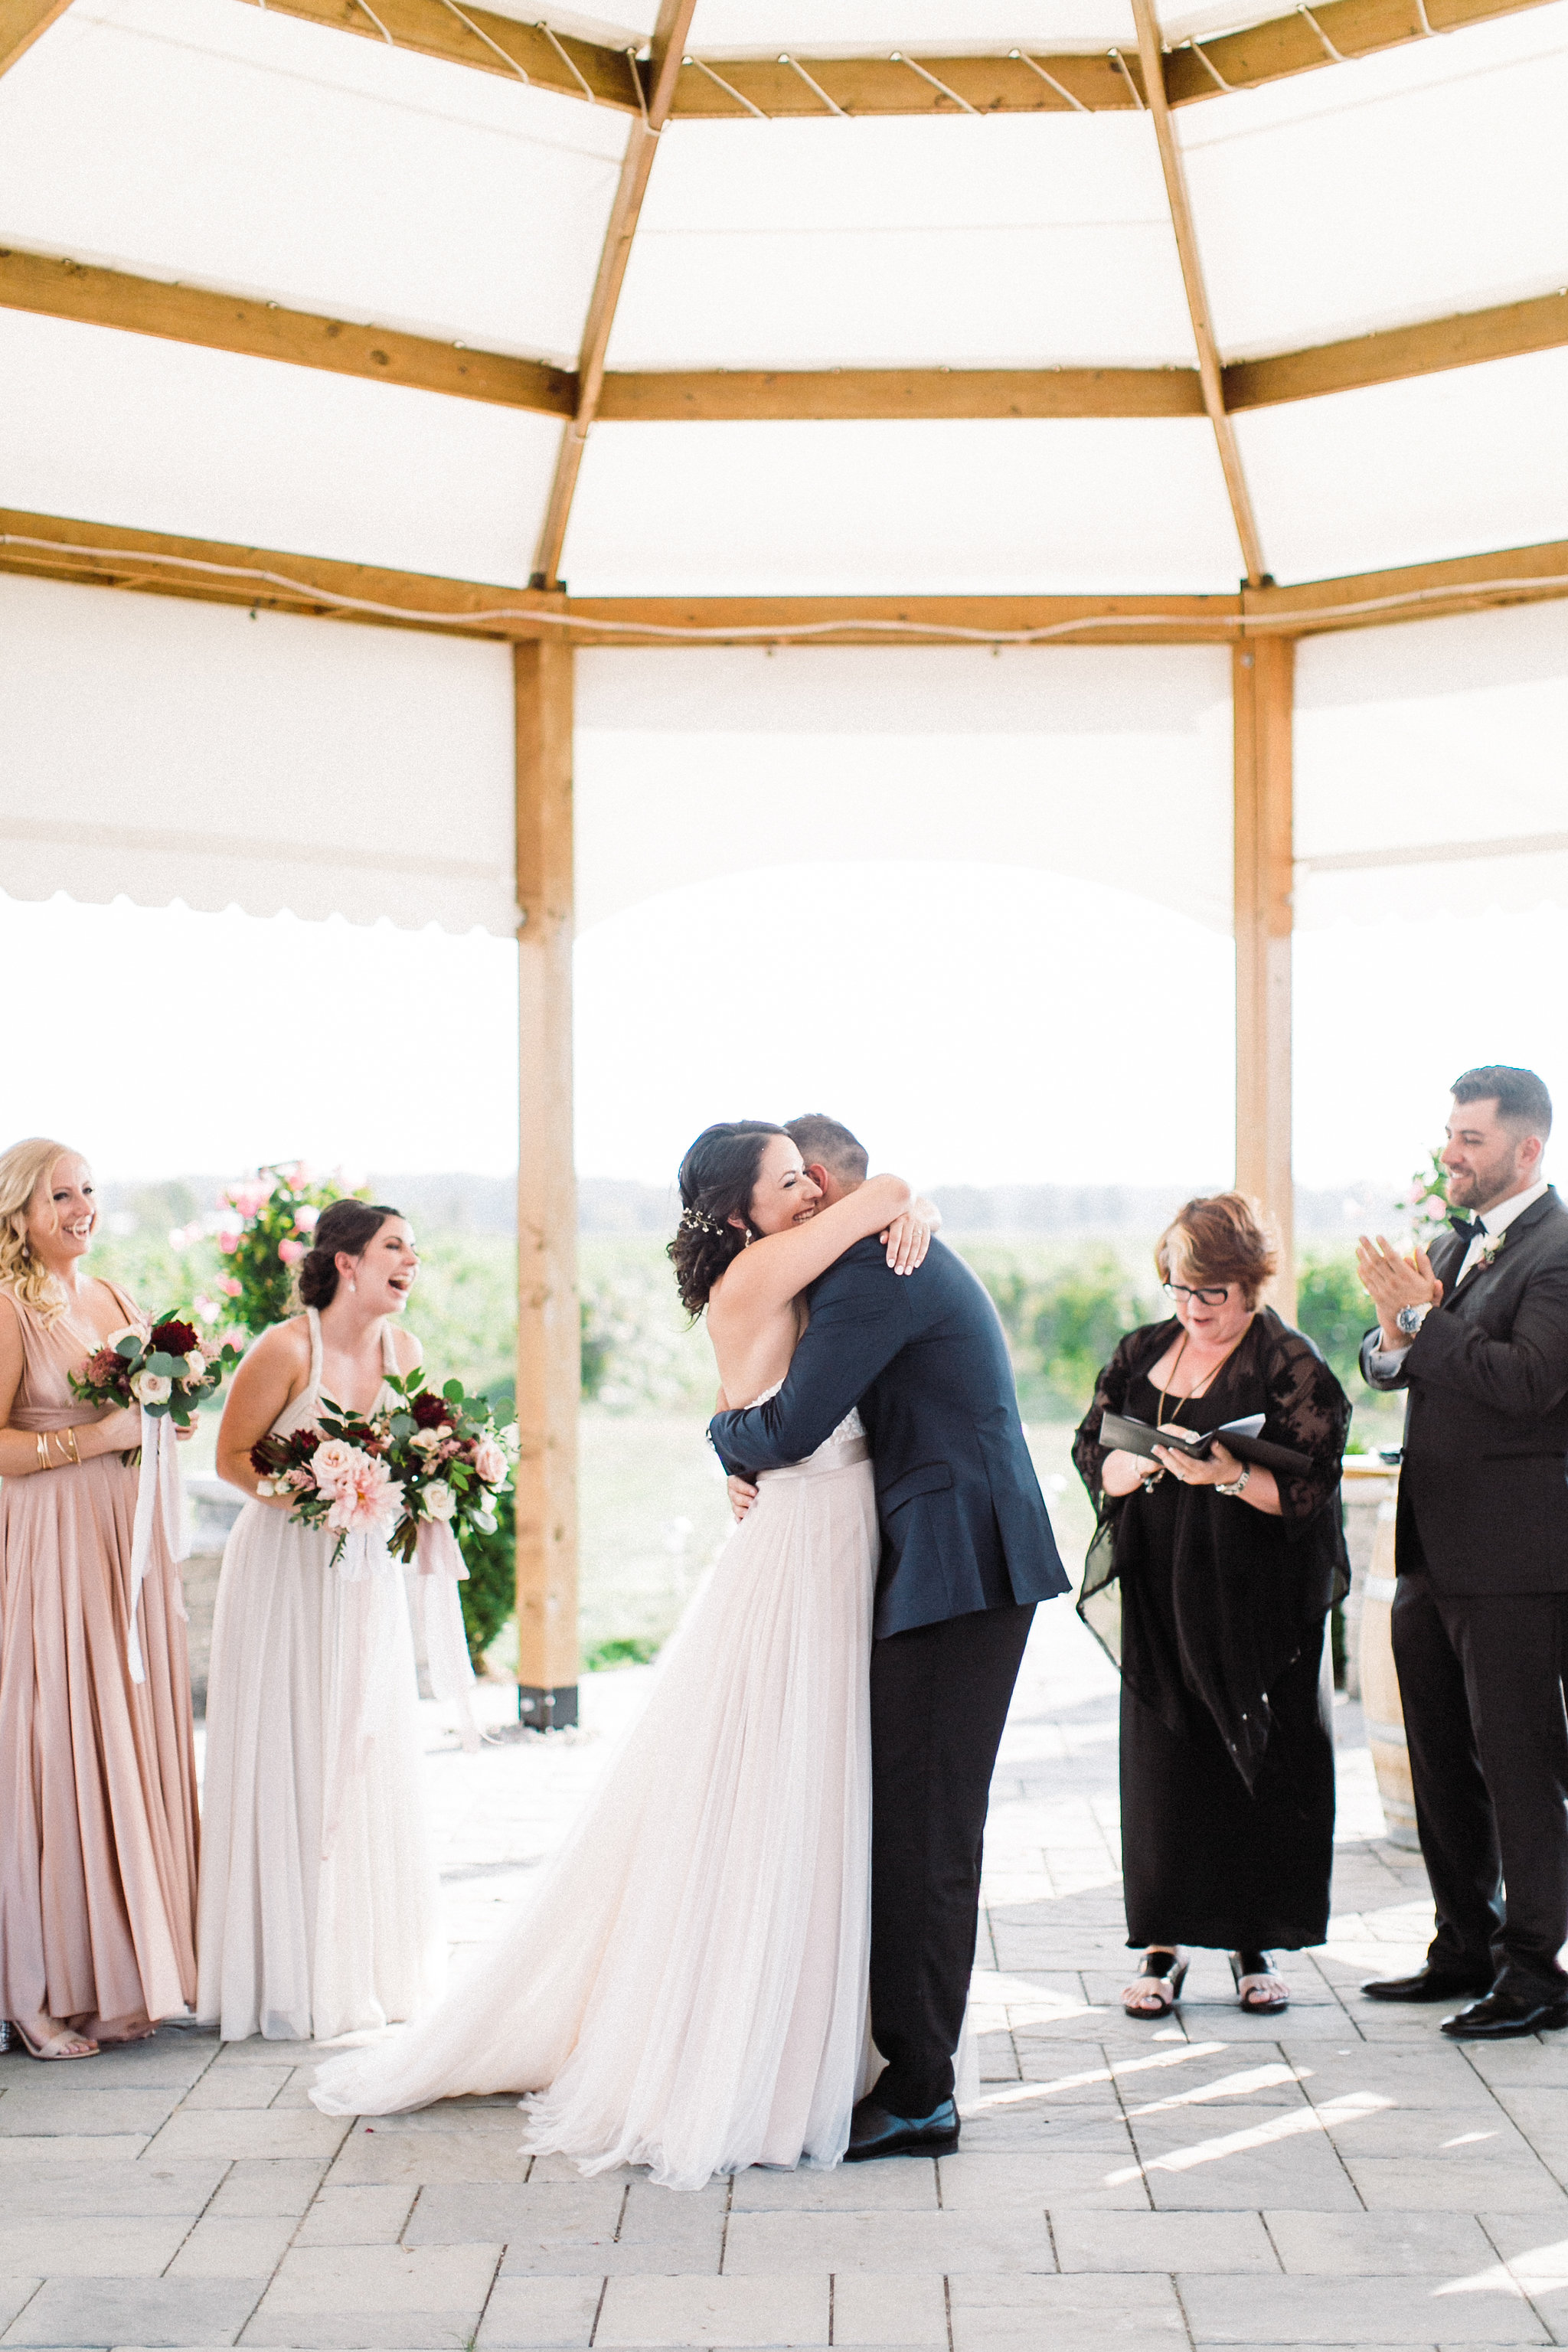 ksp_Ashleigh&Cameron_married-603.jpg